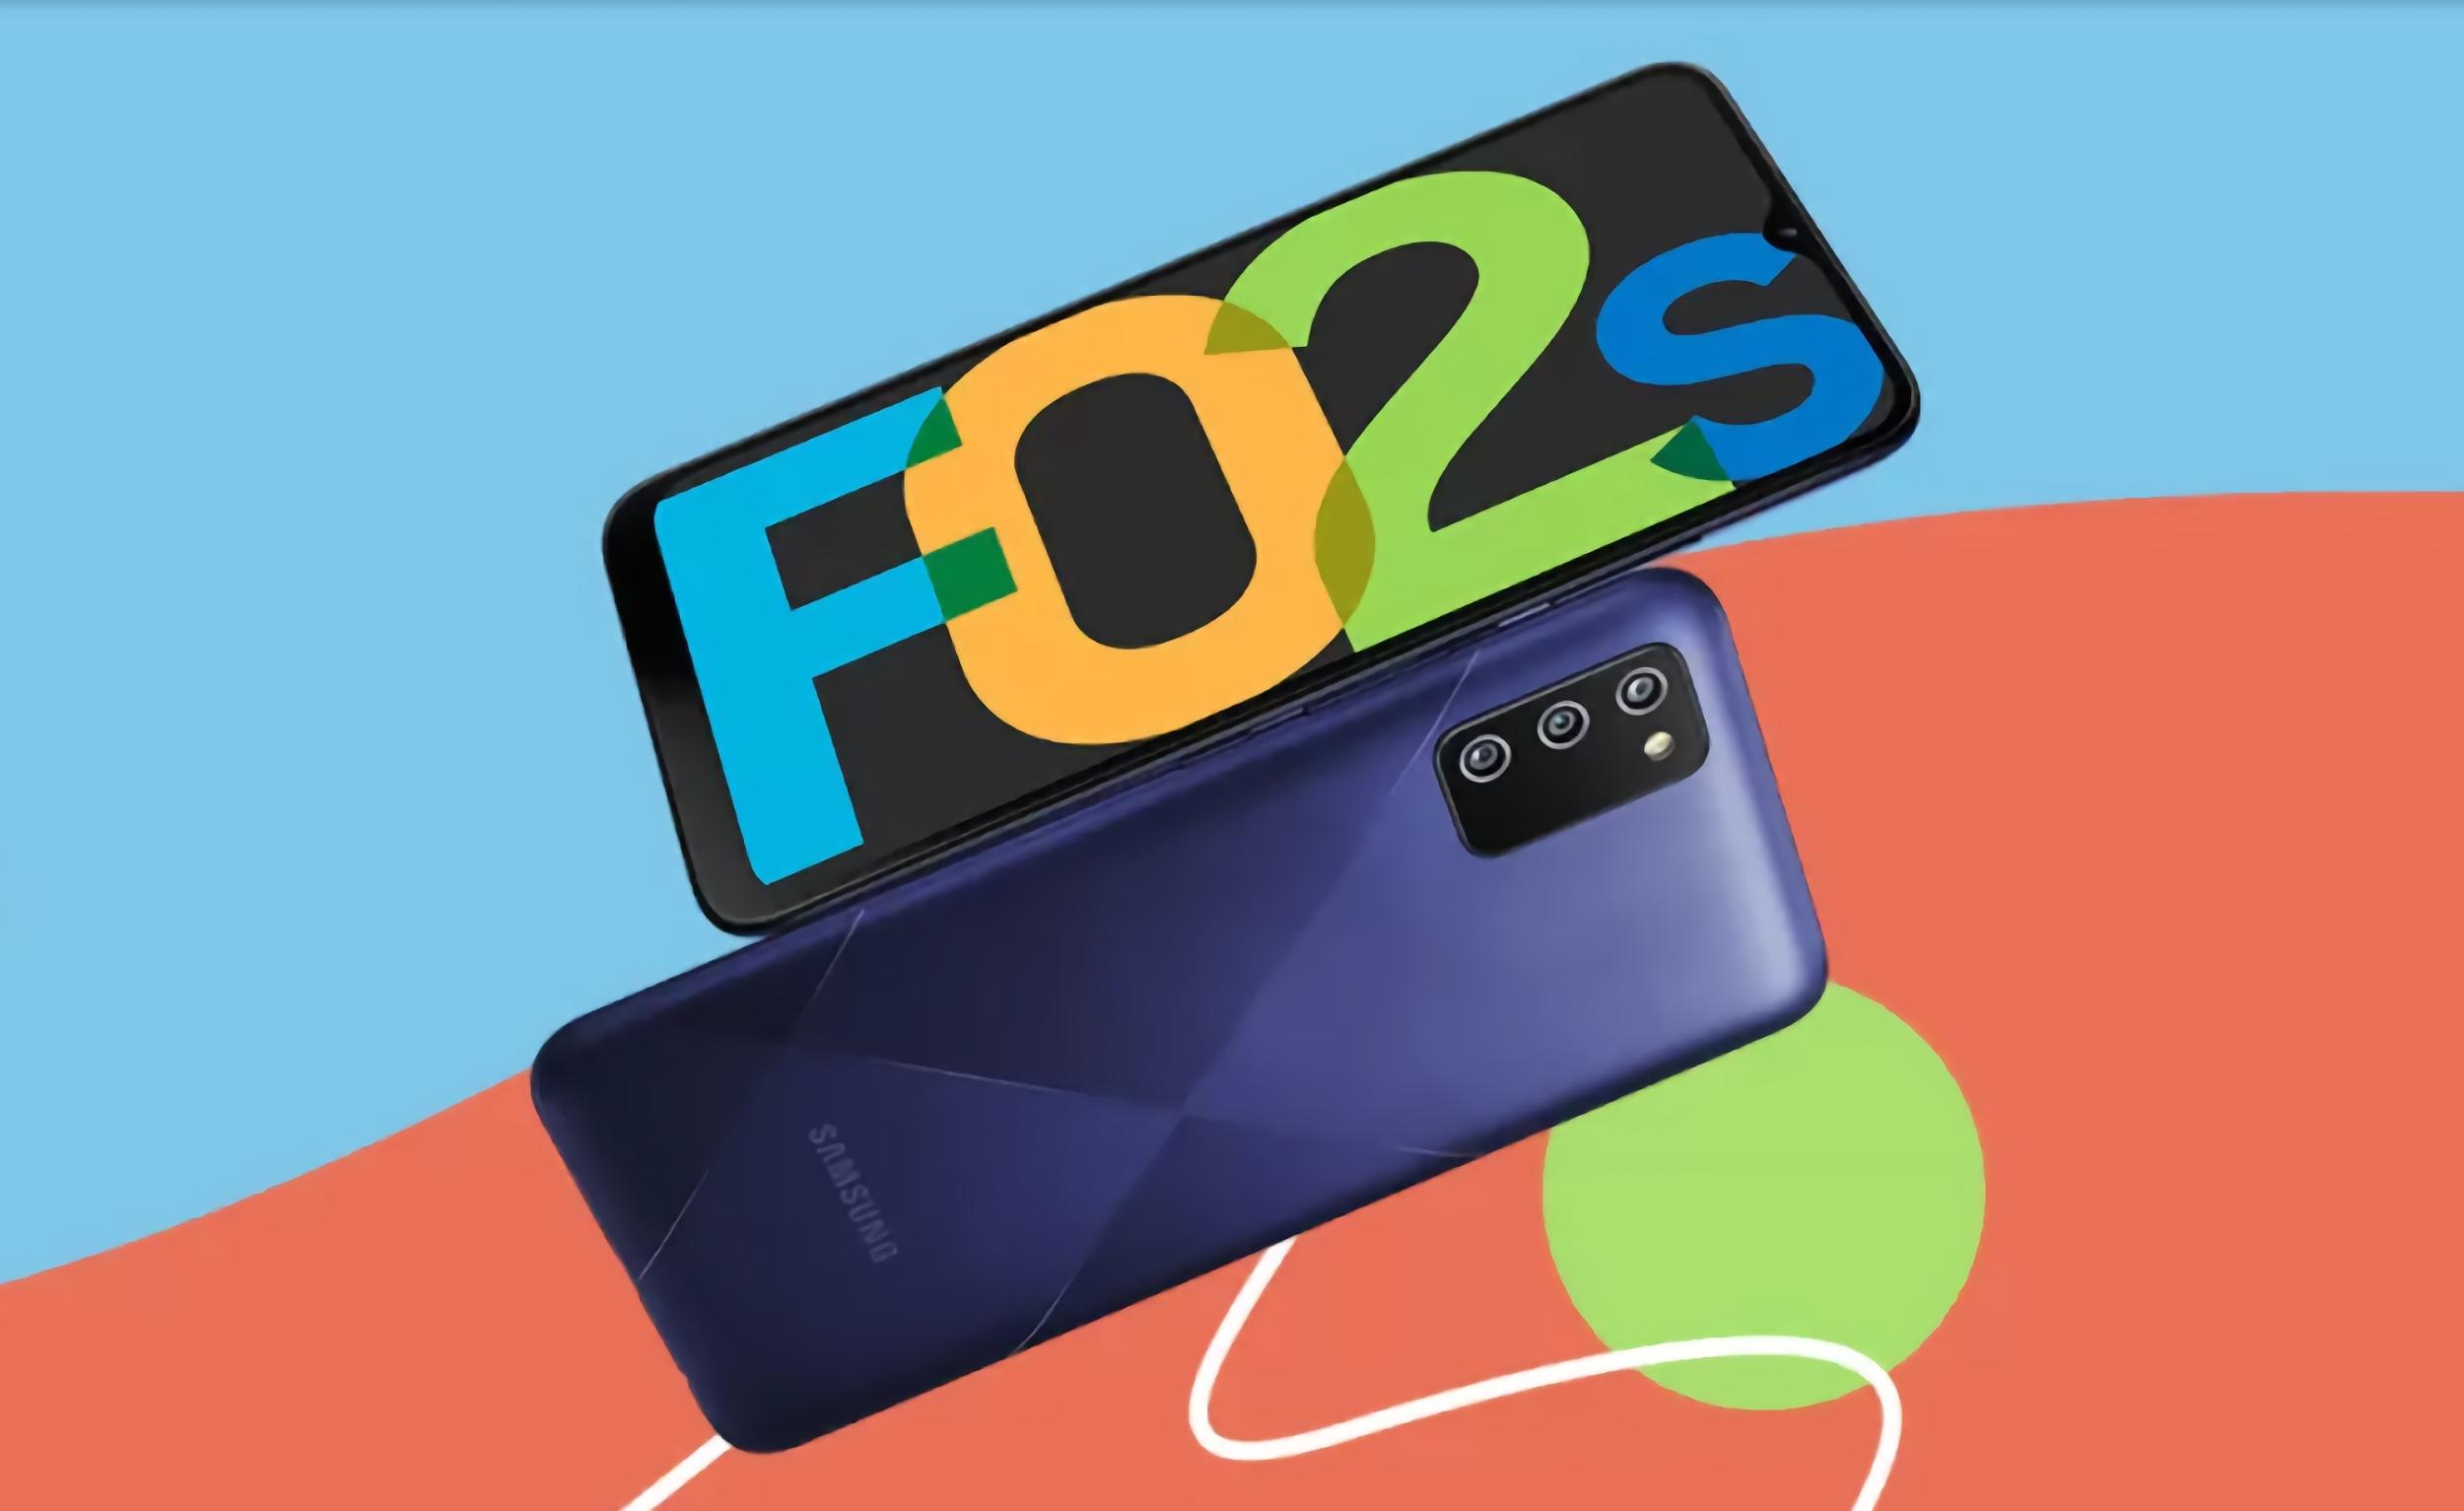 Samsung начала обновлять бюджетники Galaxy A02s, Galaxy M02s и Galaxy F02s до Android 11